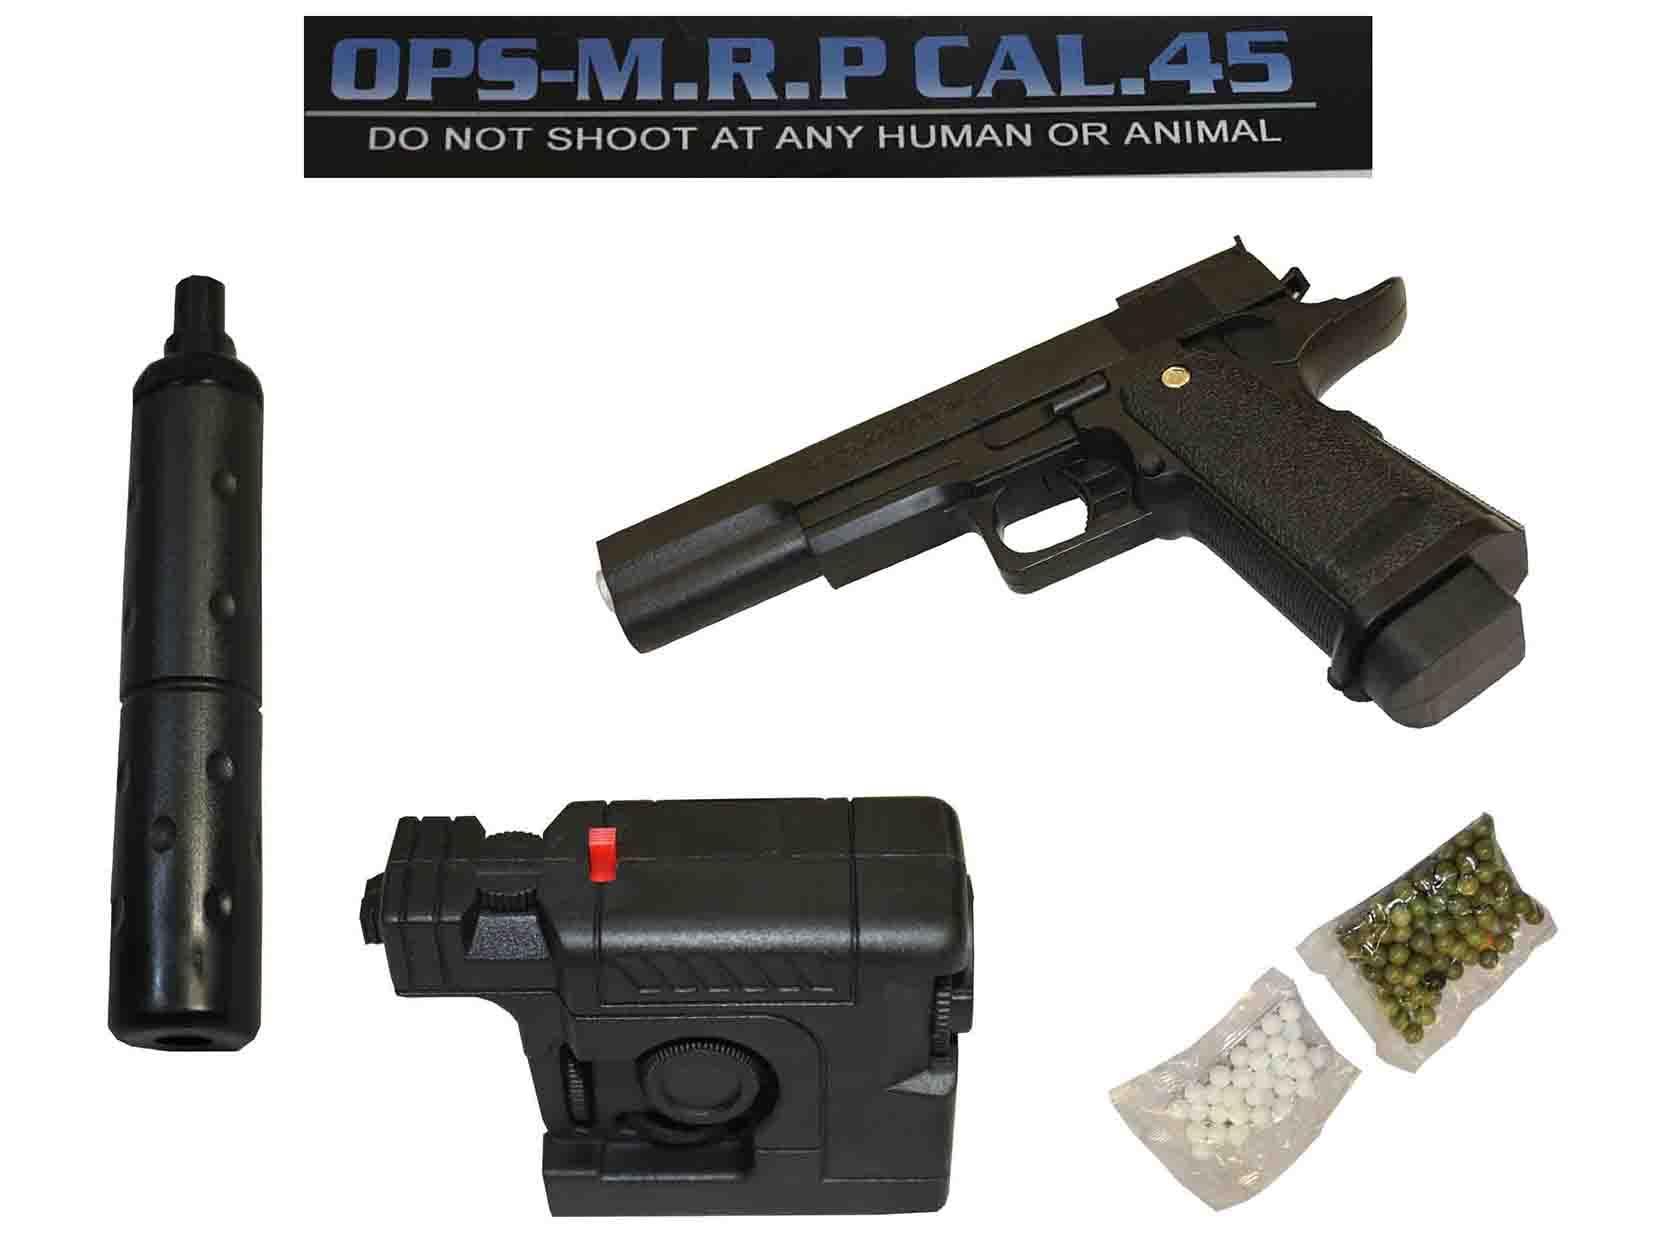 تفنگ ساچمه ای کالیبر 45